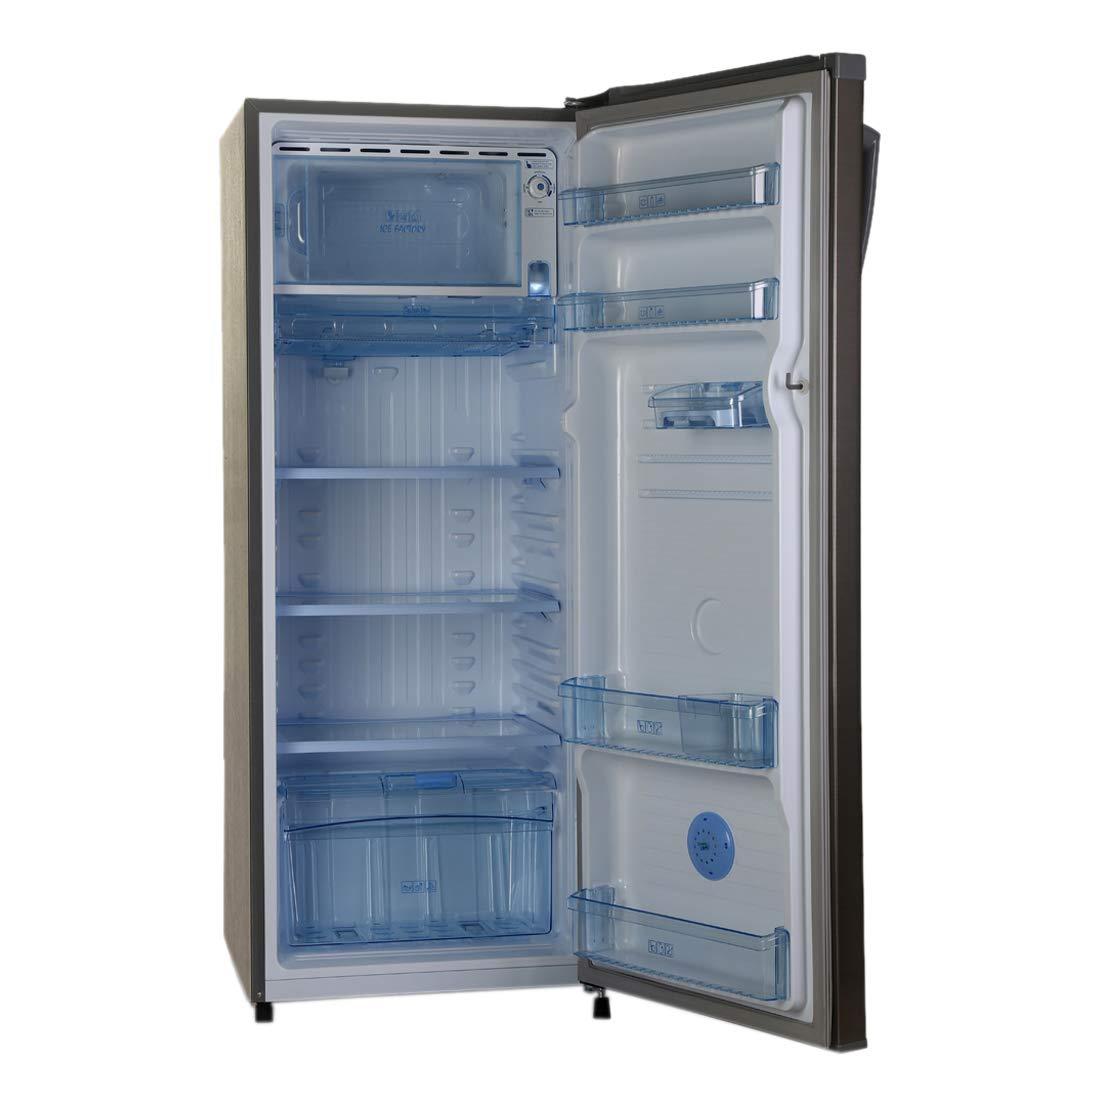 Godrej 200 L 3 Star Direct-Cool Single Door Refrigerator